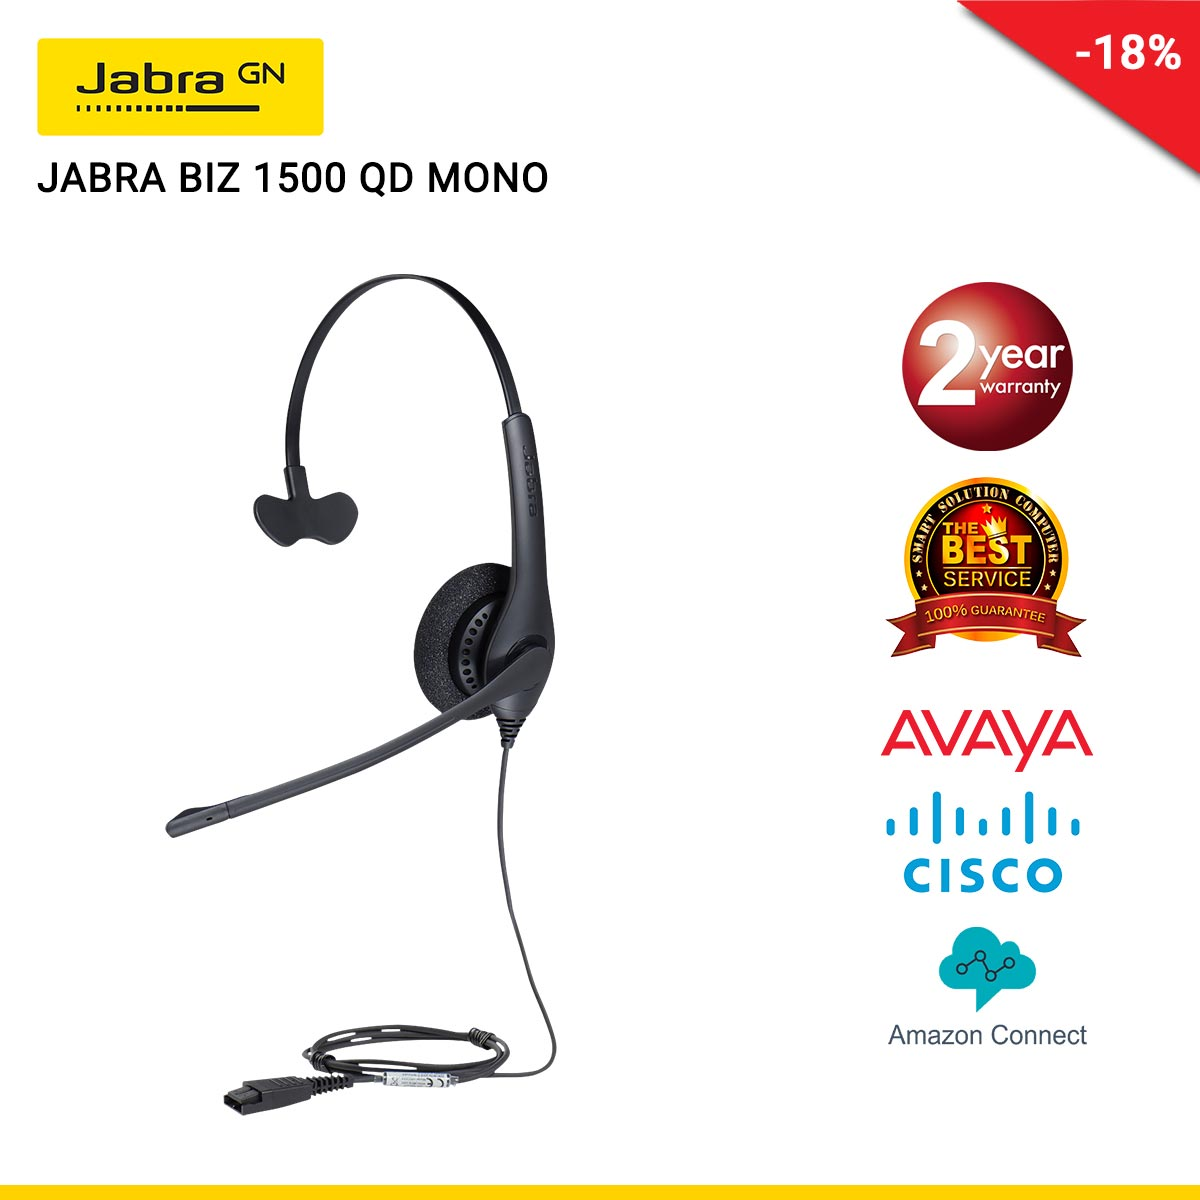 JABRA BIZ 1500 QD MONO (JBA-1513-0157)